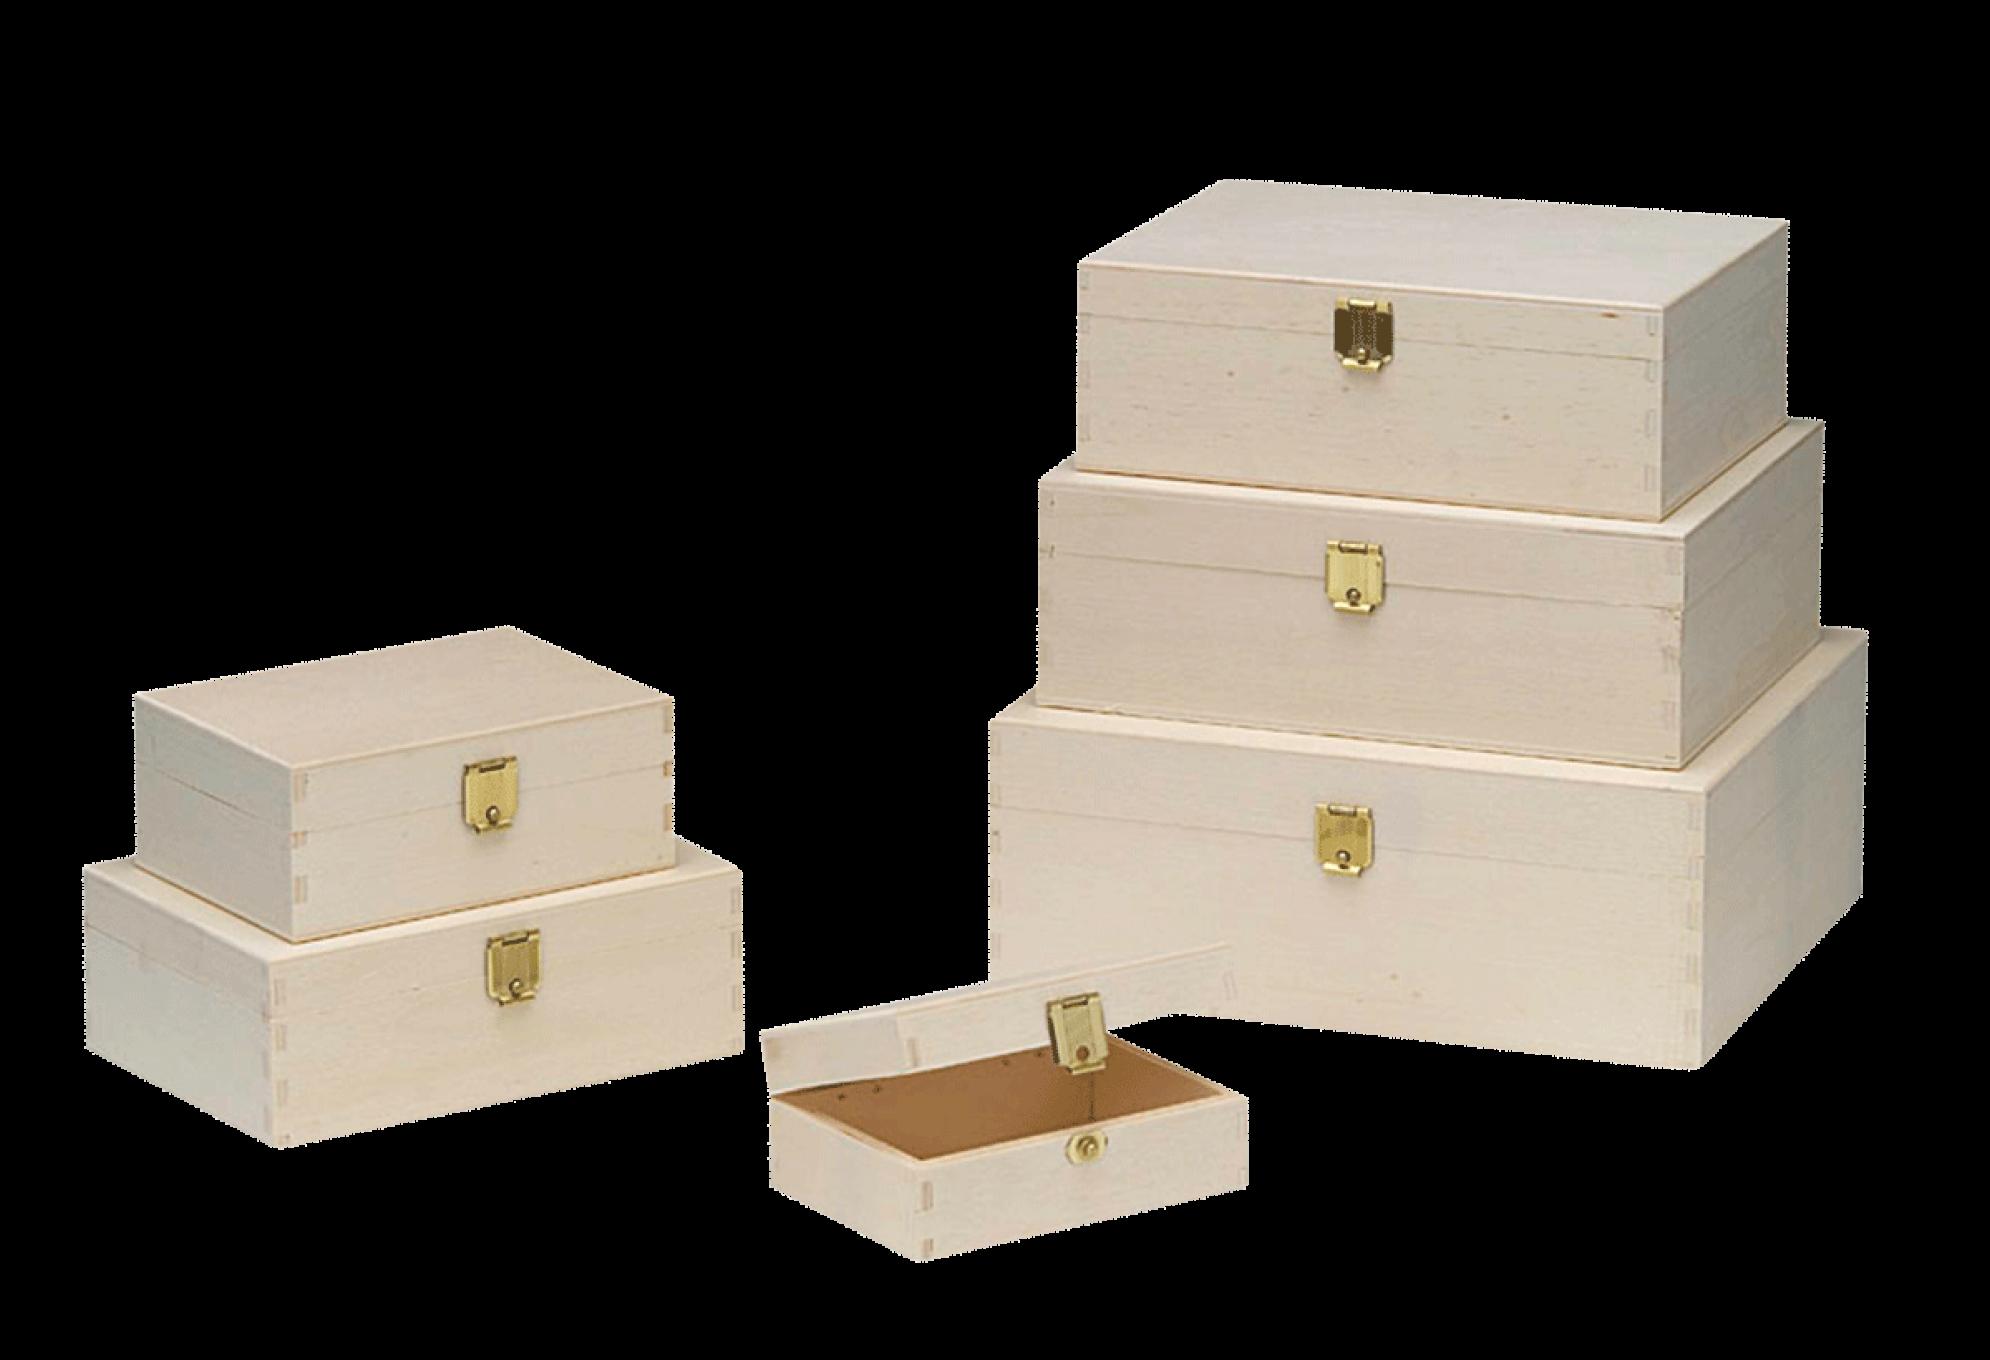 holzkassetten holzschatullen holzk stchen holztruhen. Black Bedroom Furniture Sets. Home Design Ideas